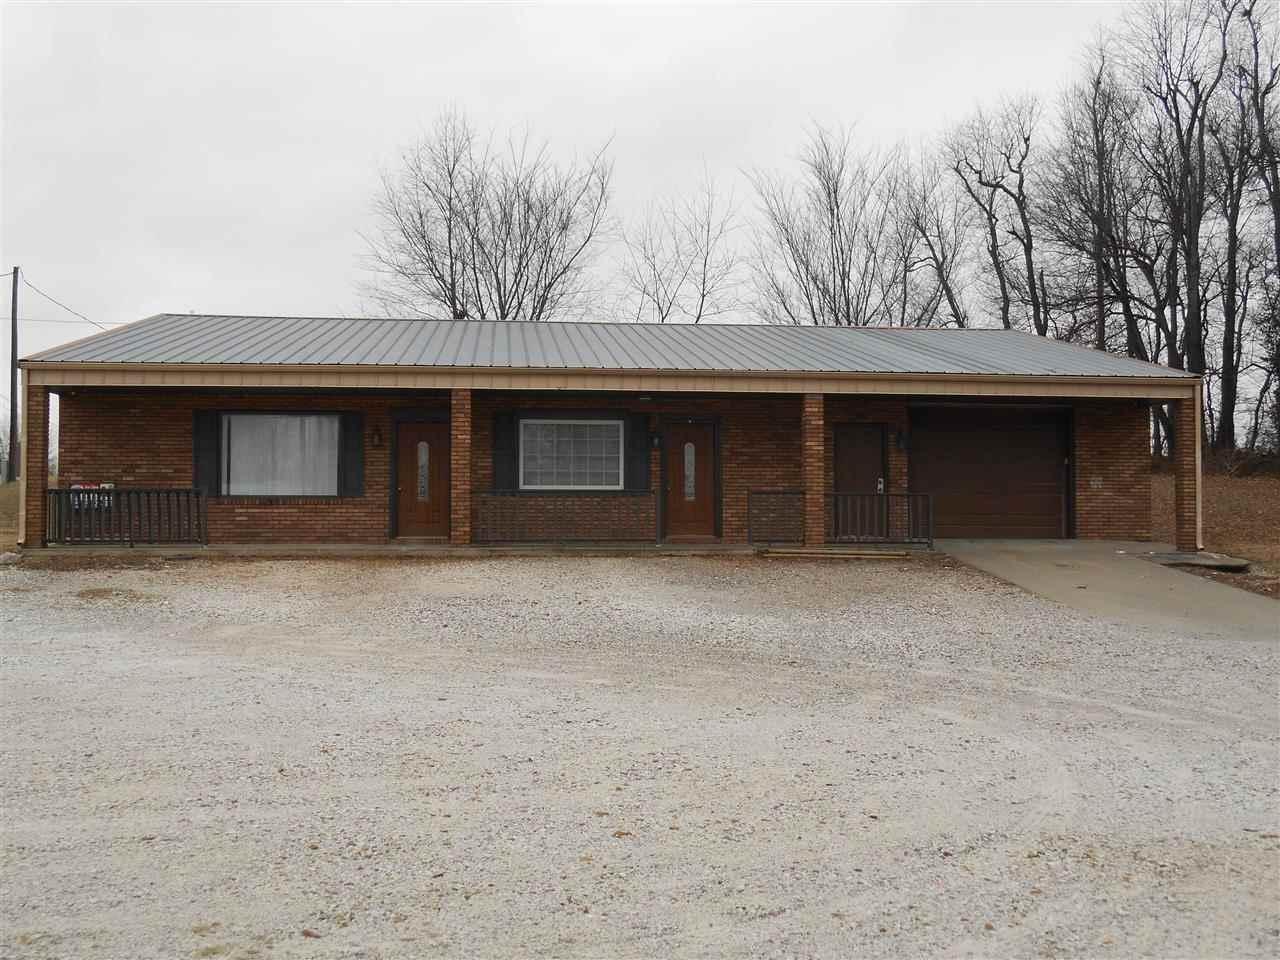 7551 Gage Road, Kevil, Kentucky 42053